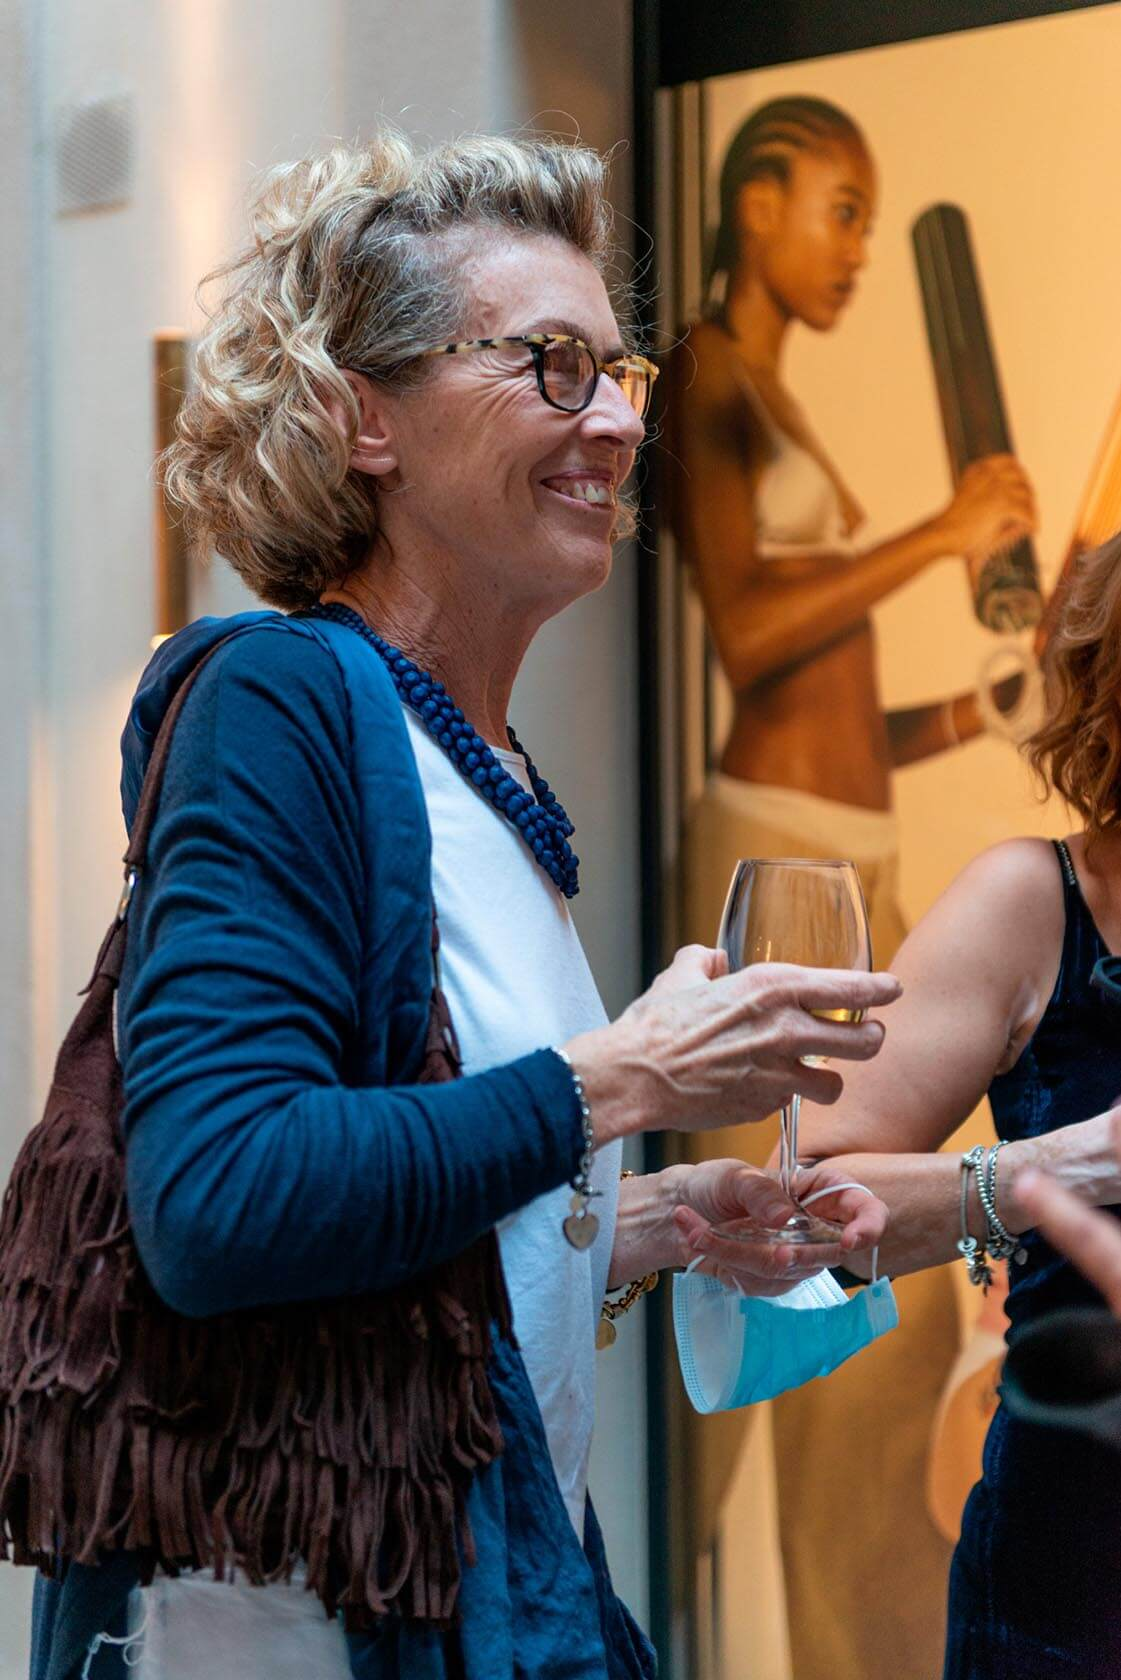 Gerda Vossaert visiting the LAUFEN space MIlano exhibition.